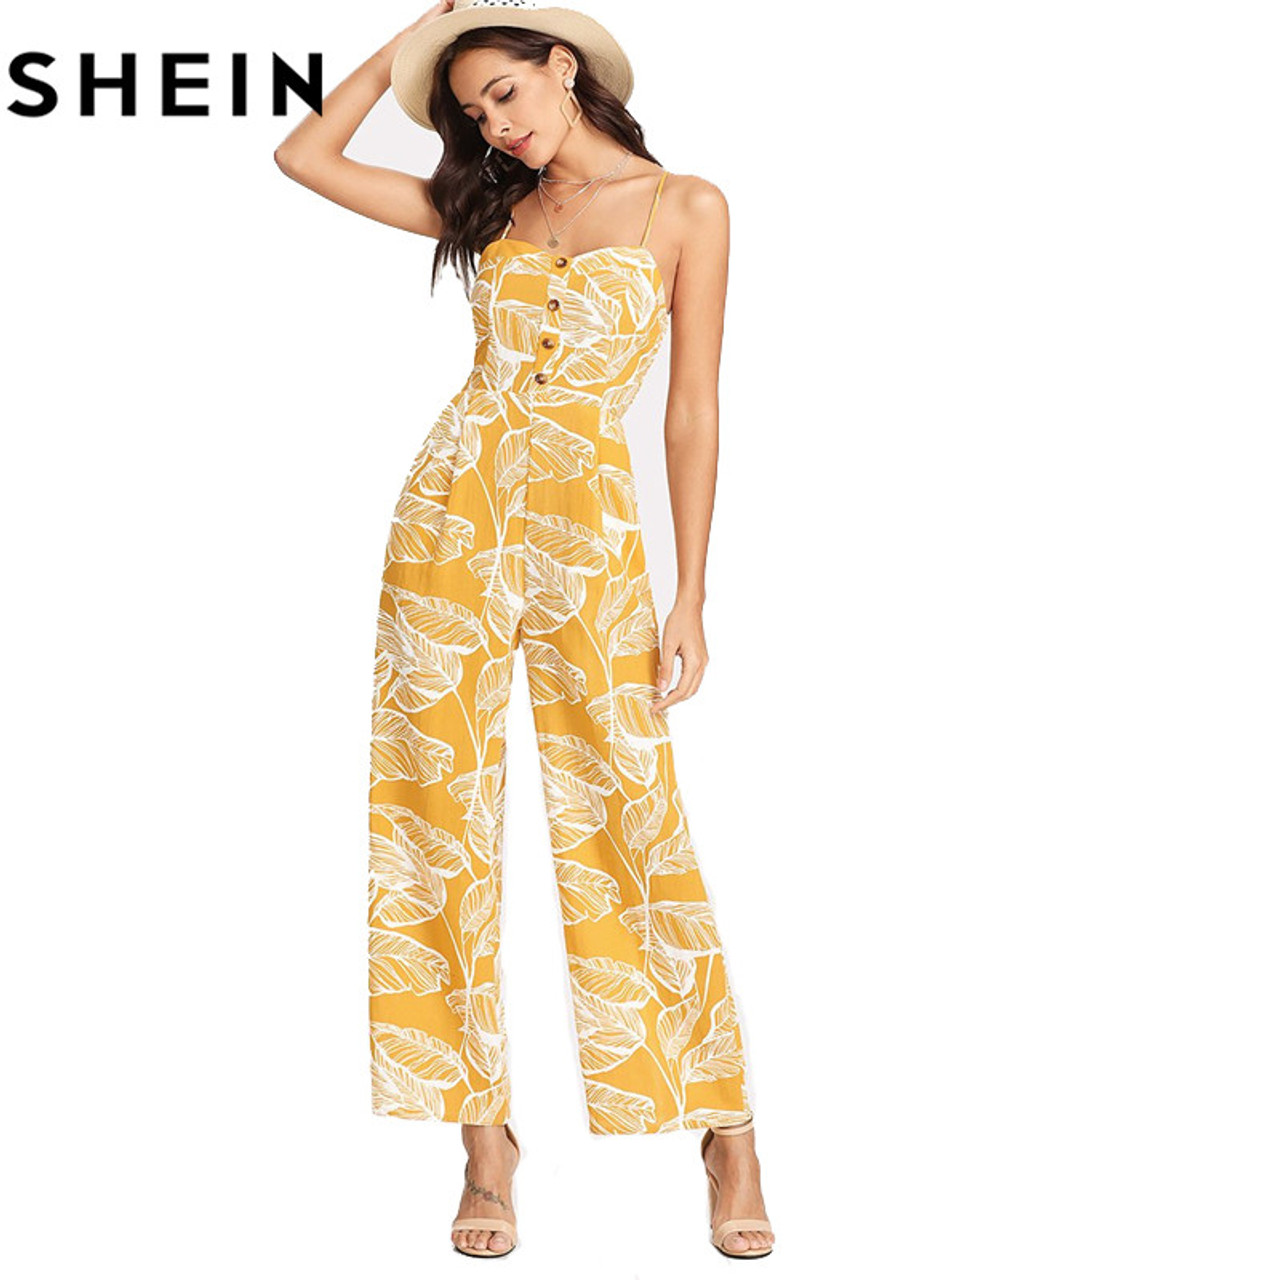 d6ccf681786 ... SHEIN Summer Vacation 2018 Spaghetti Strap Boho High Waist Tropical  Palm Leaf Print Shirred Wide Leg ...